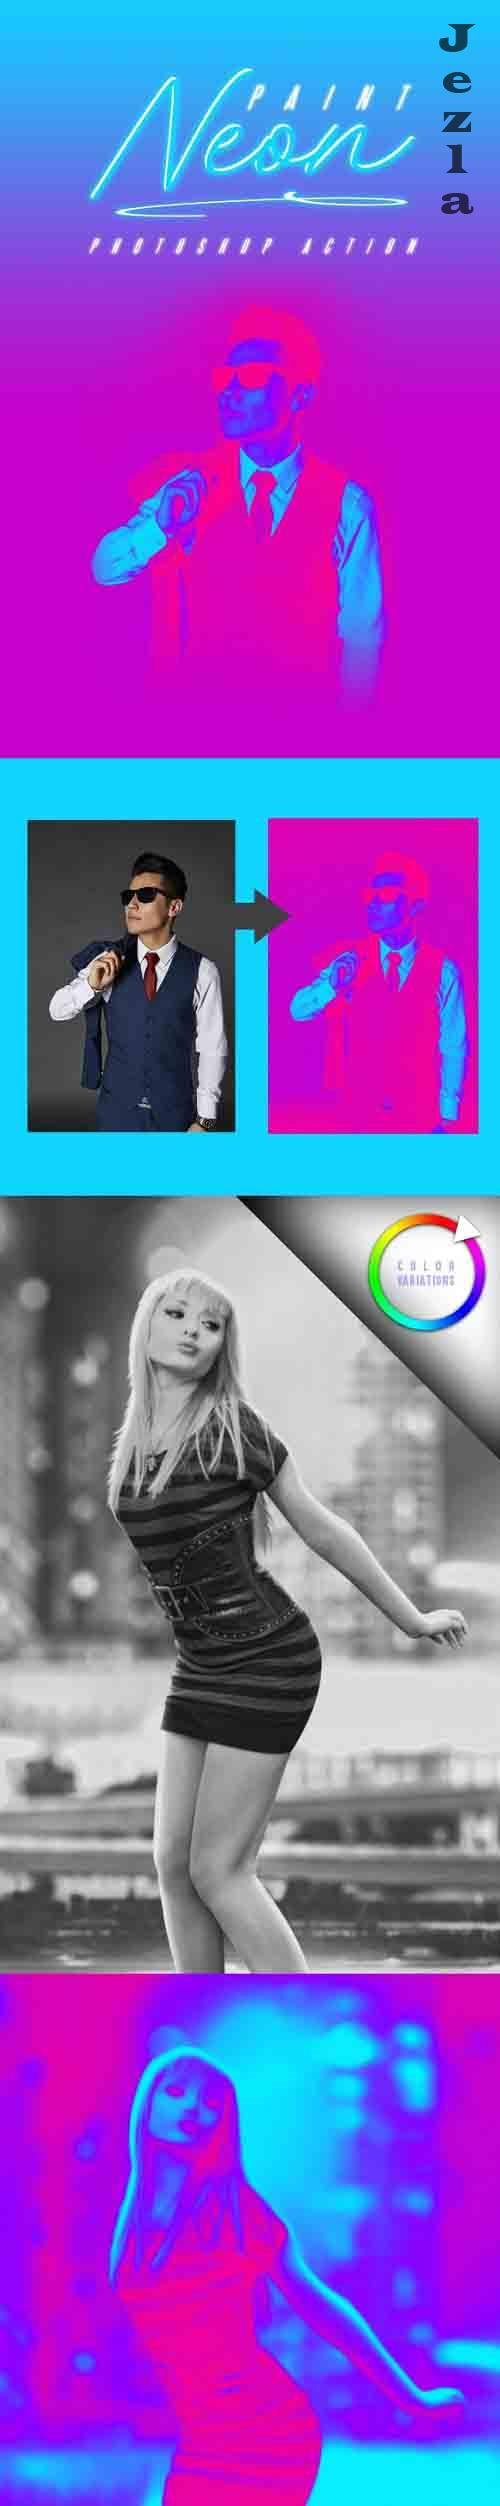 GraphicRiver - Neon Paint Photoshop Effect 29001495